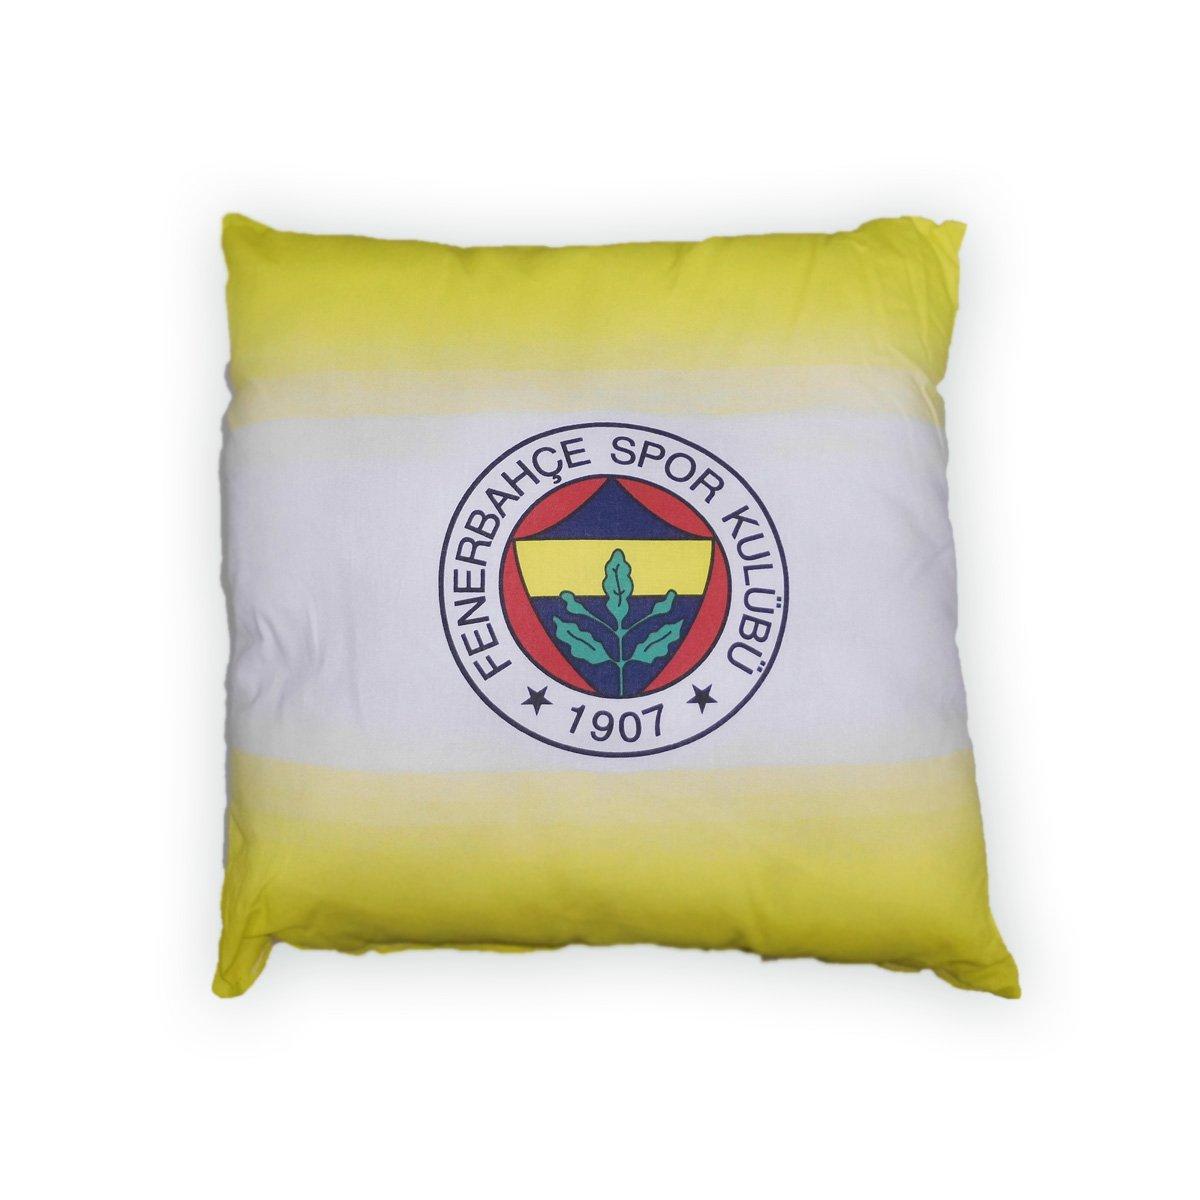 Kissen Fenerbahce Istanbul 40x40 cm Striped Fenerbah/çe yastık kırlent original lizenziert